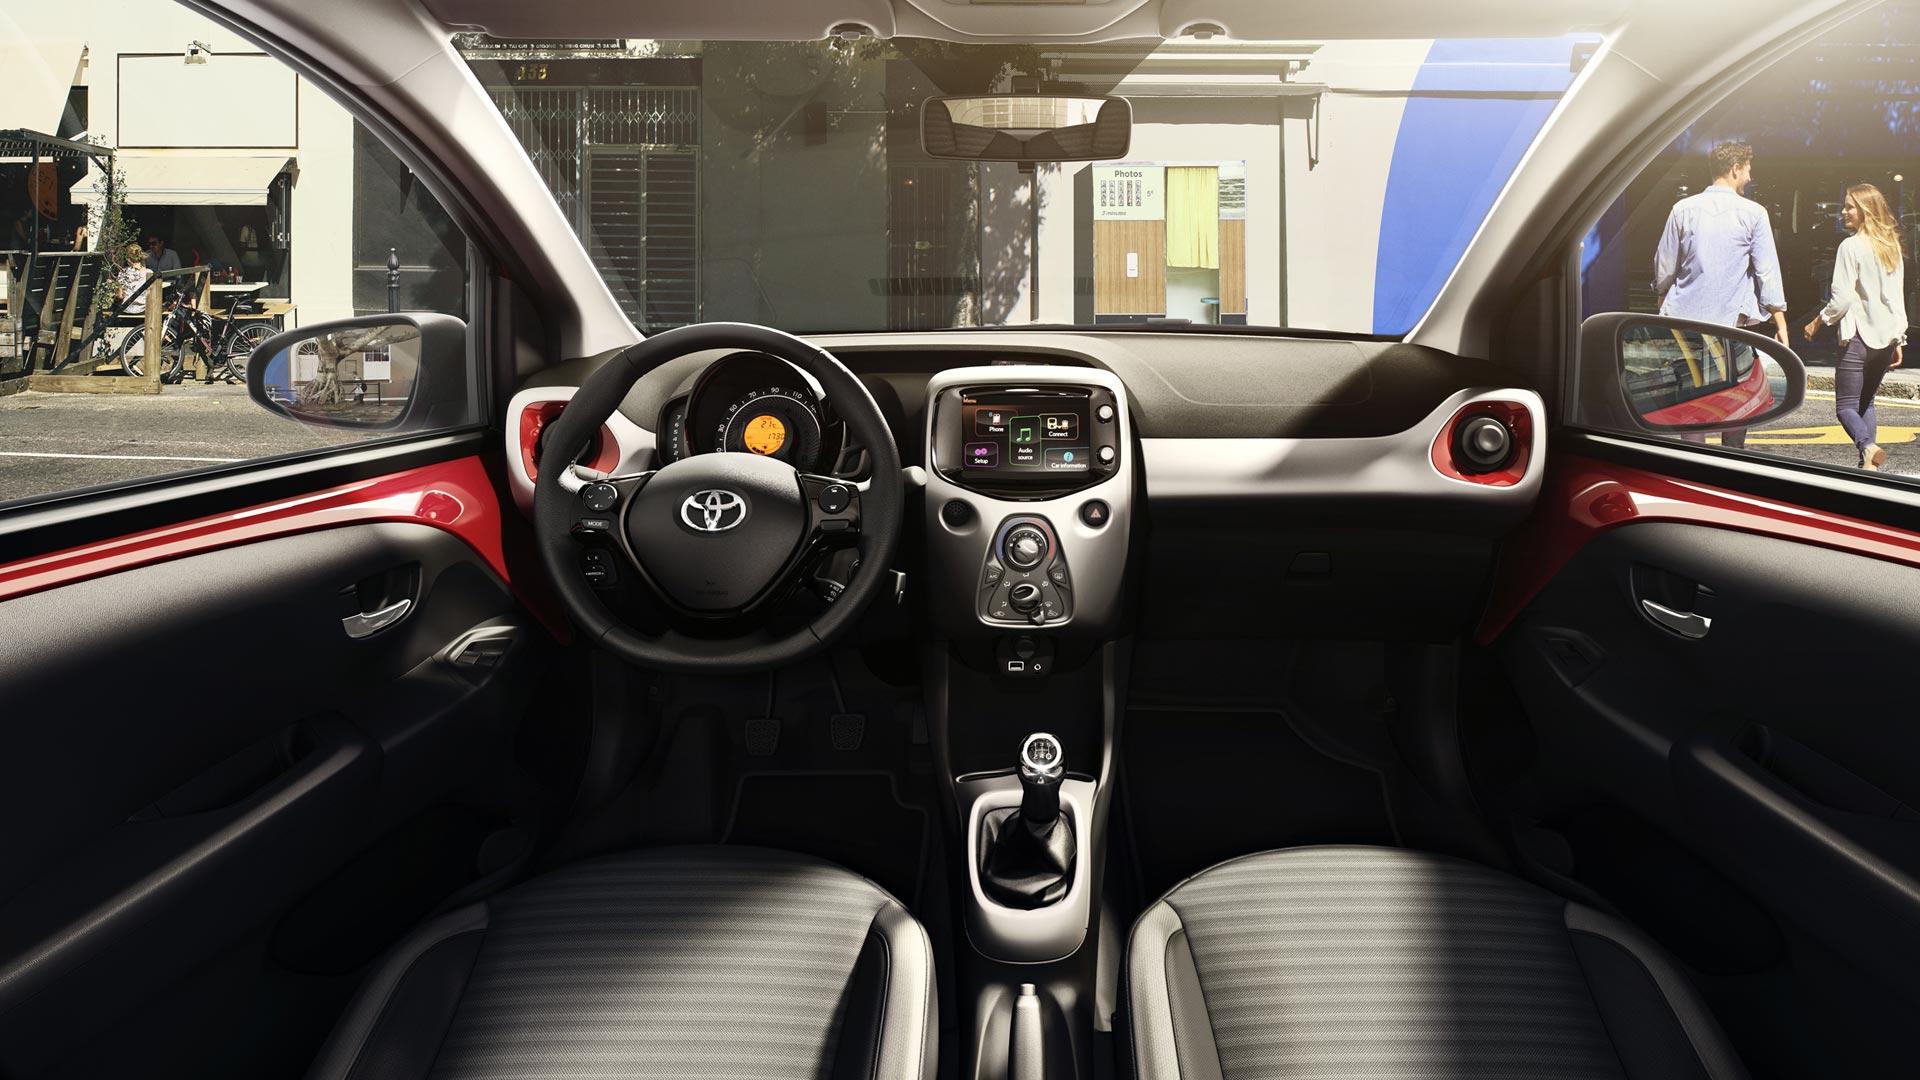 Toyota Aygo Der Charmante Cityflitzer Fl 252 Ckiger Autohaus